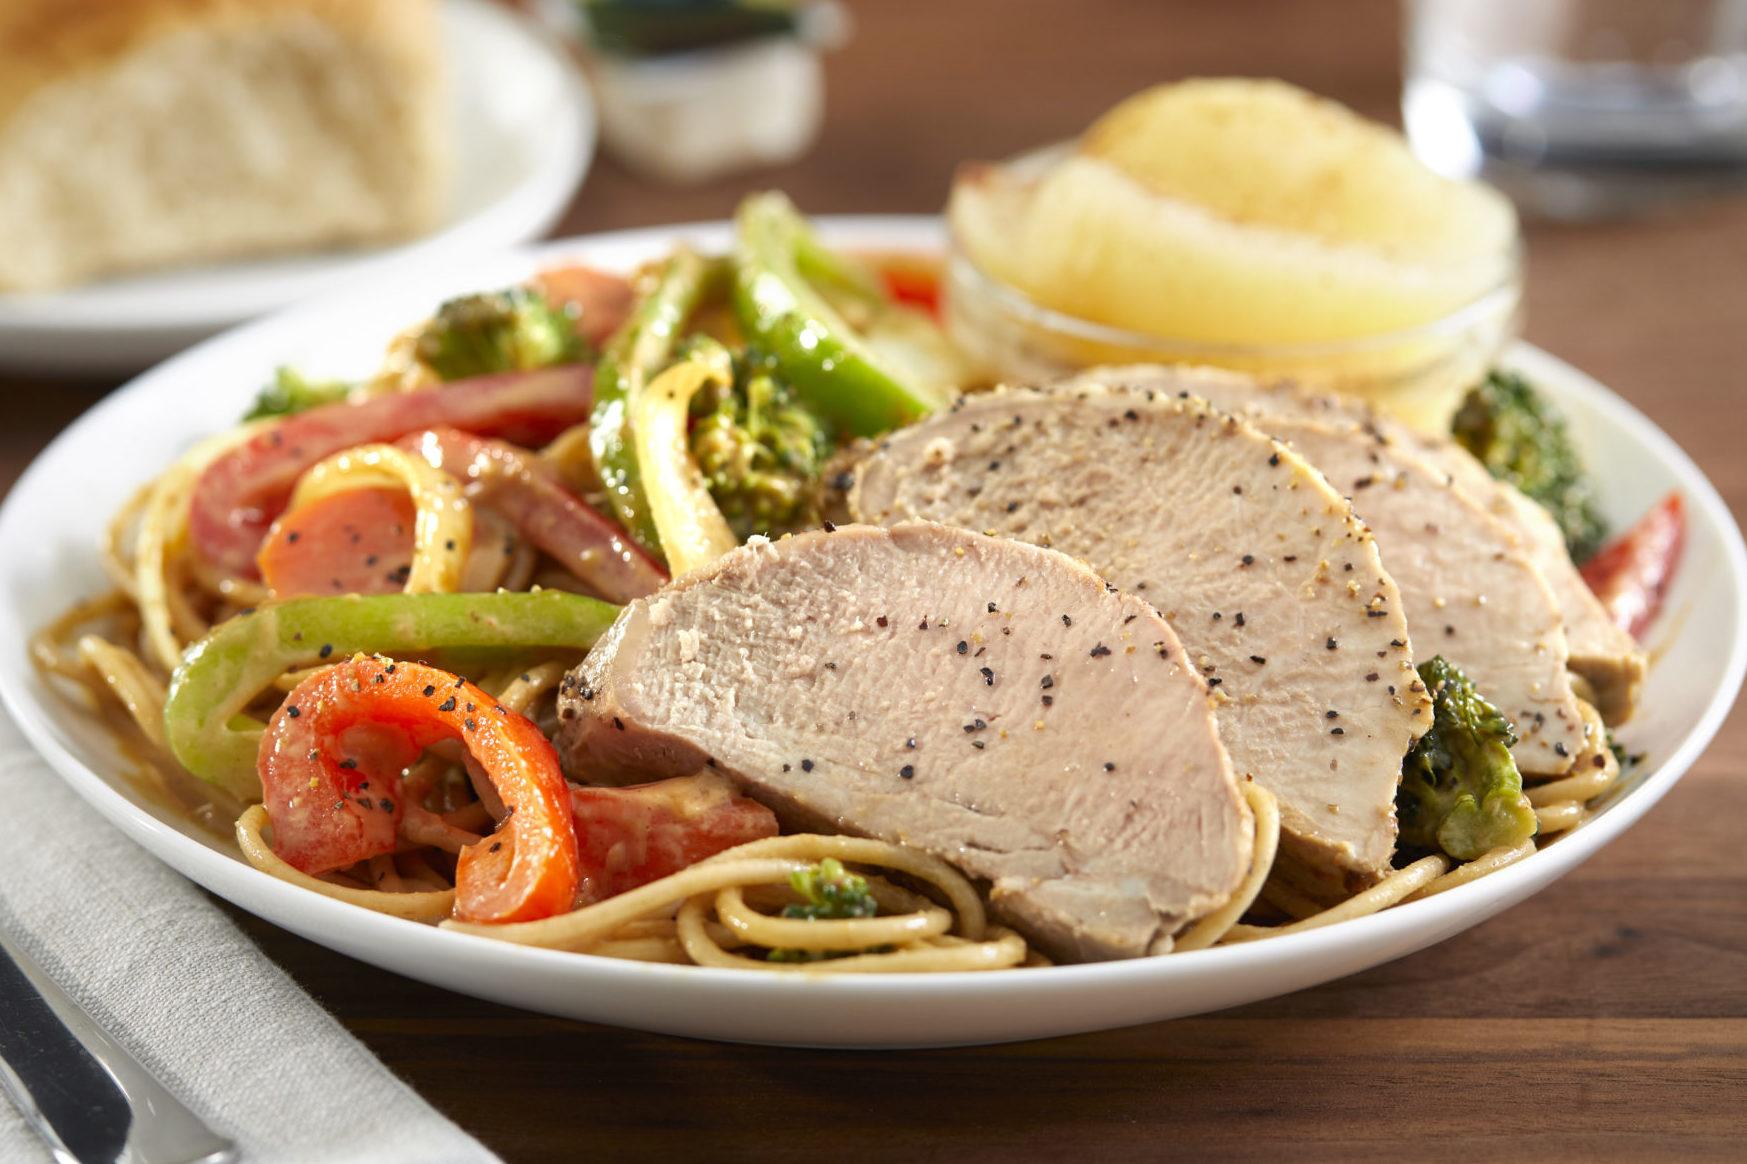 Sesame Noodles and Pork